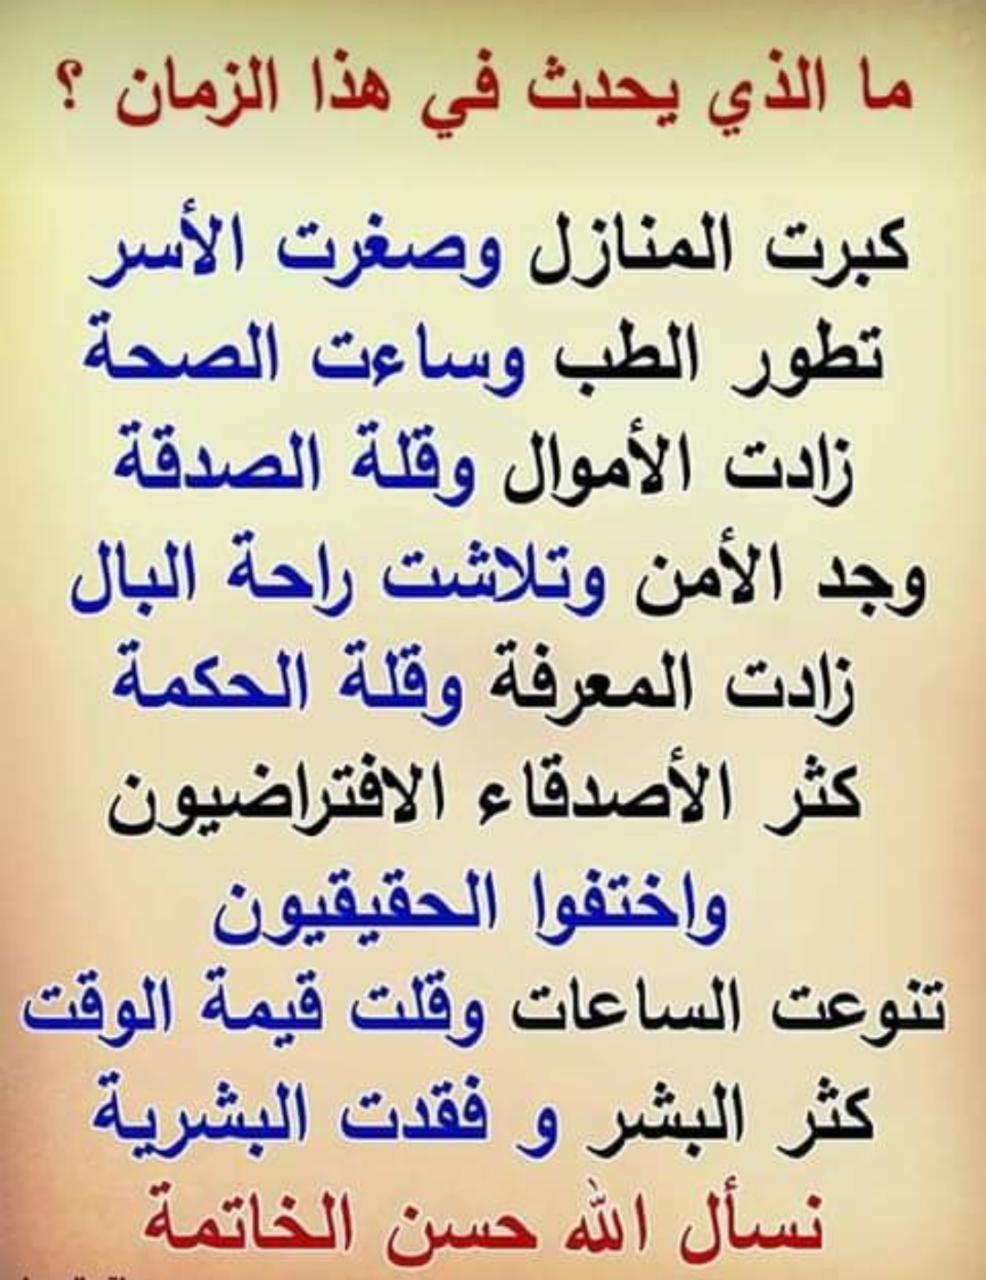 Pin By Sameer Ali On مقتطفات ثمينة Really Good Quotes Best Quotes Arabic Jokes